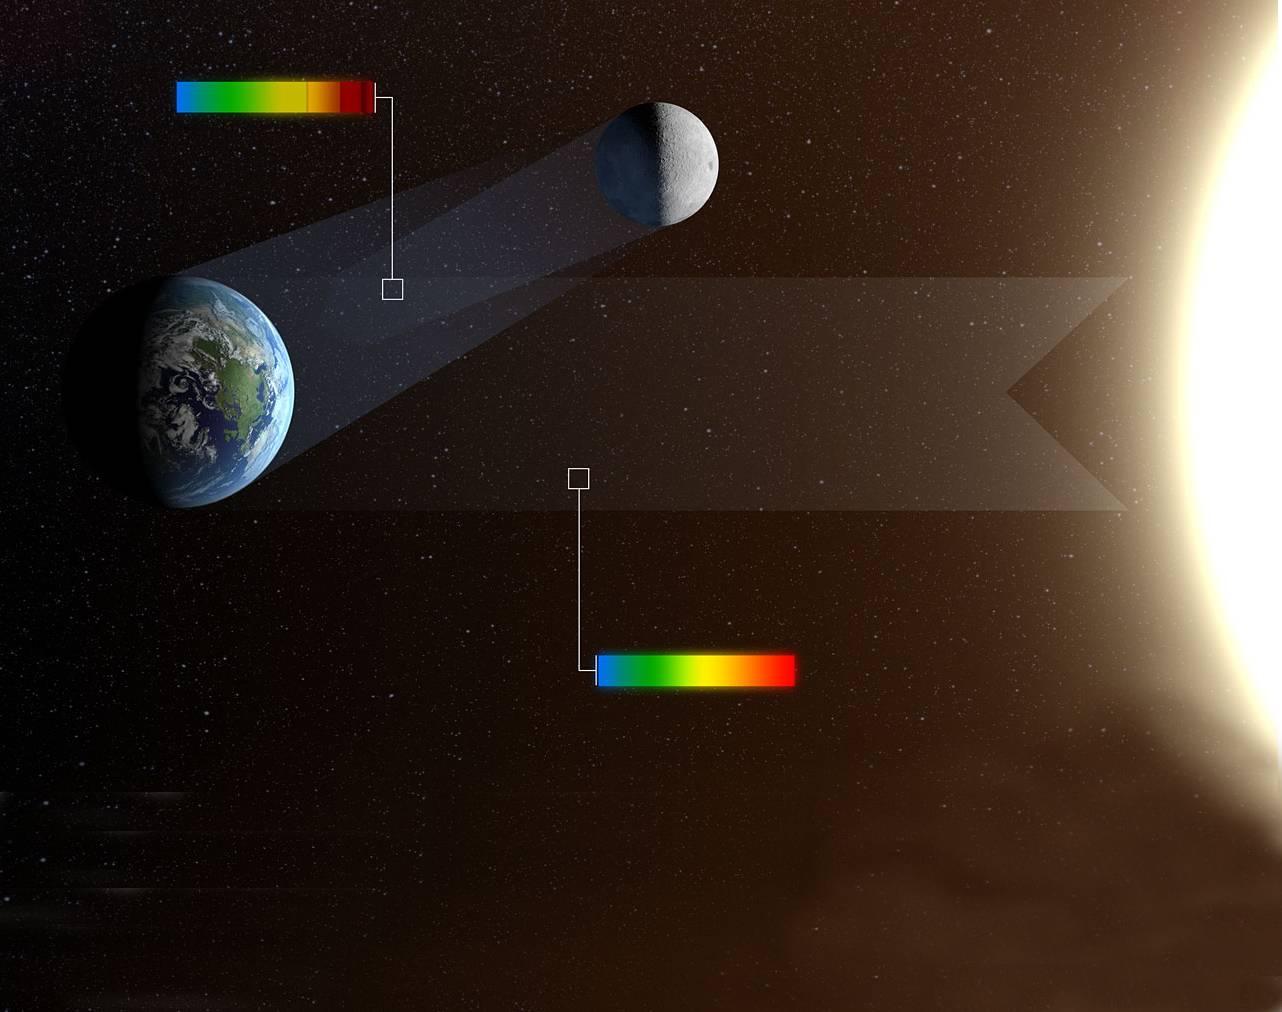 El brillo de la Tierra se refleja sobre la Luna. Imagen: ESO/L. Calçada.